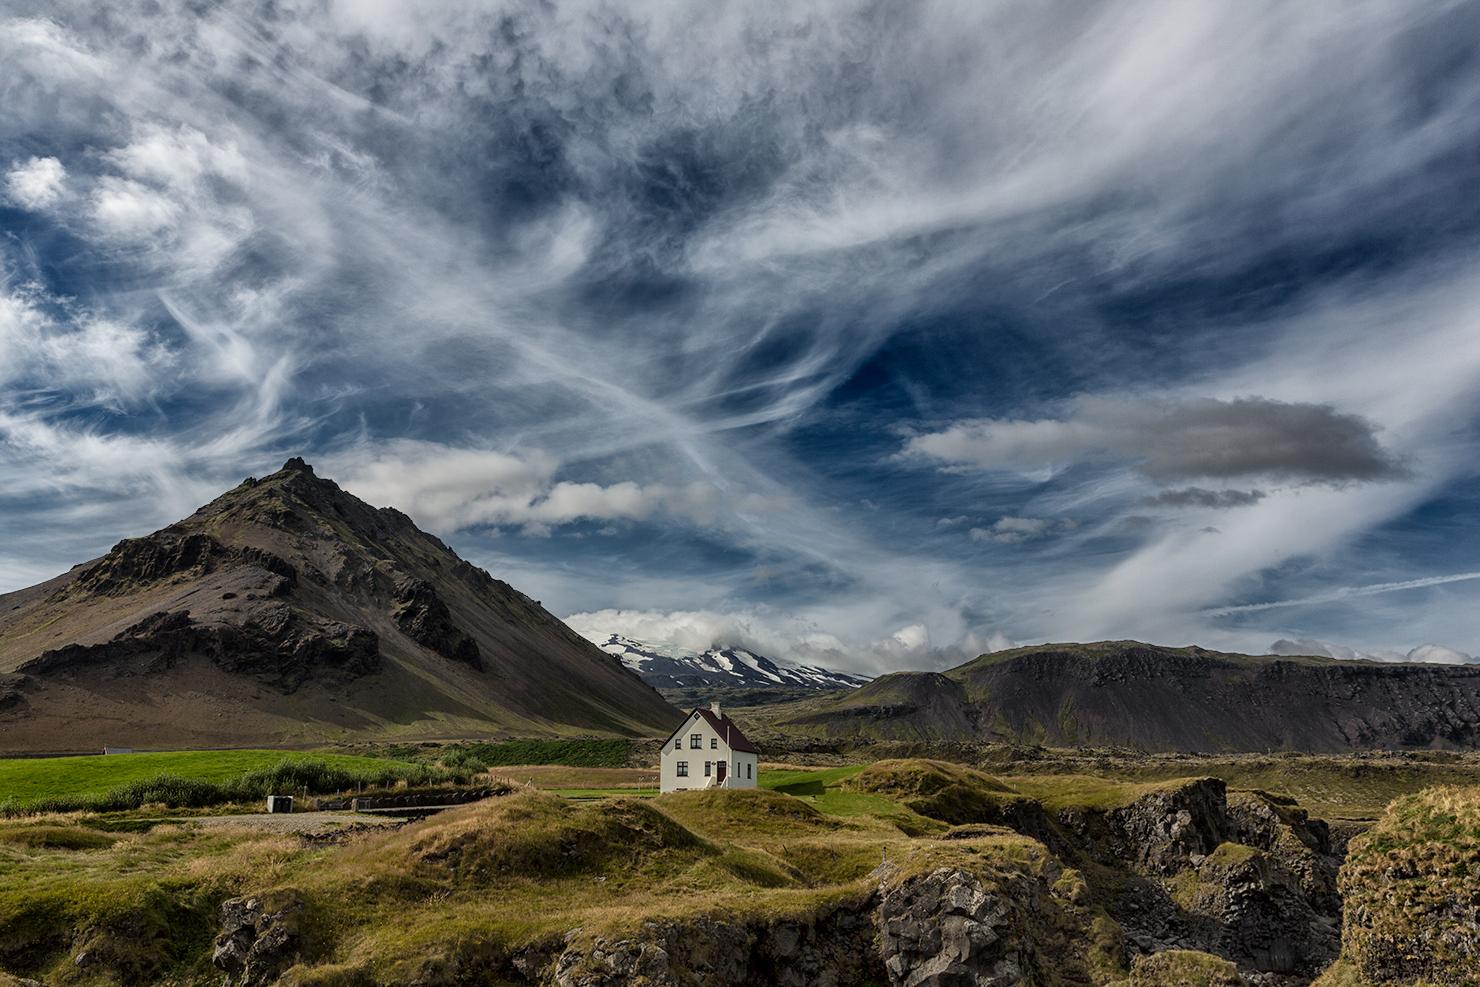 Arnarstapi是一个位于冰岛西部的斯奈山半岛景区内的小镇